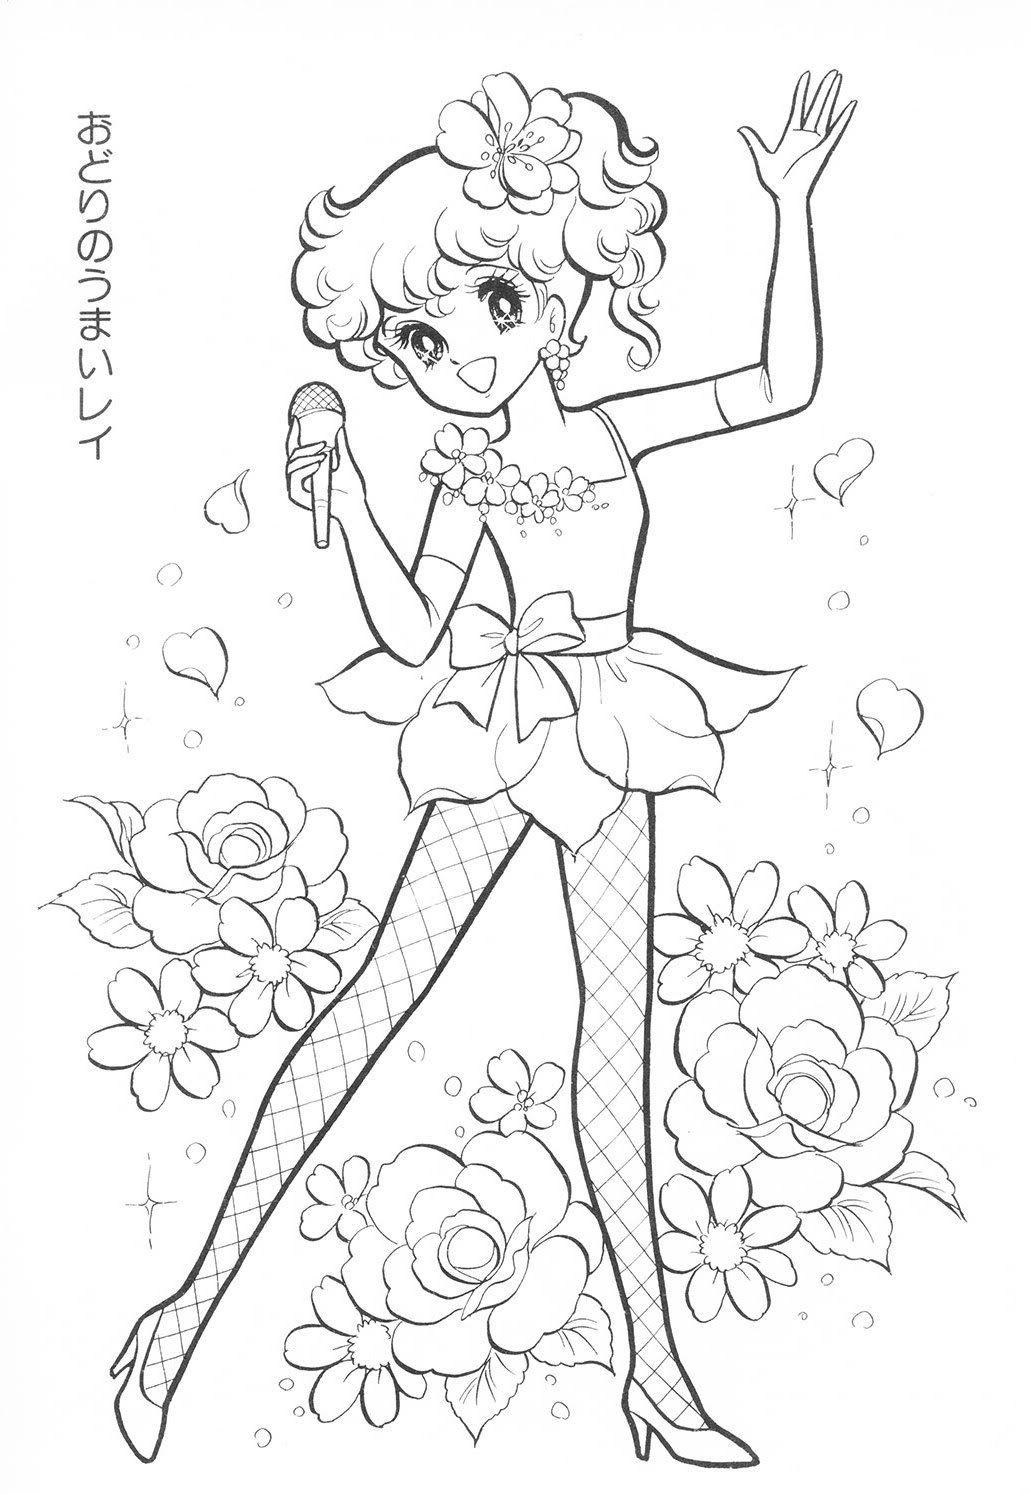 photo Melody-Pops-03.jpg | 버닝 | Pinterest | Dibujos para pintar ...